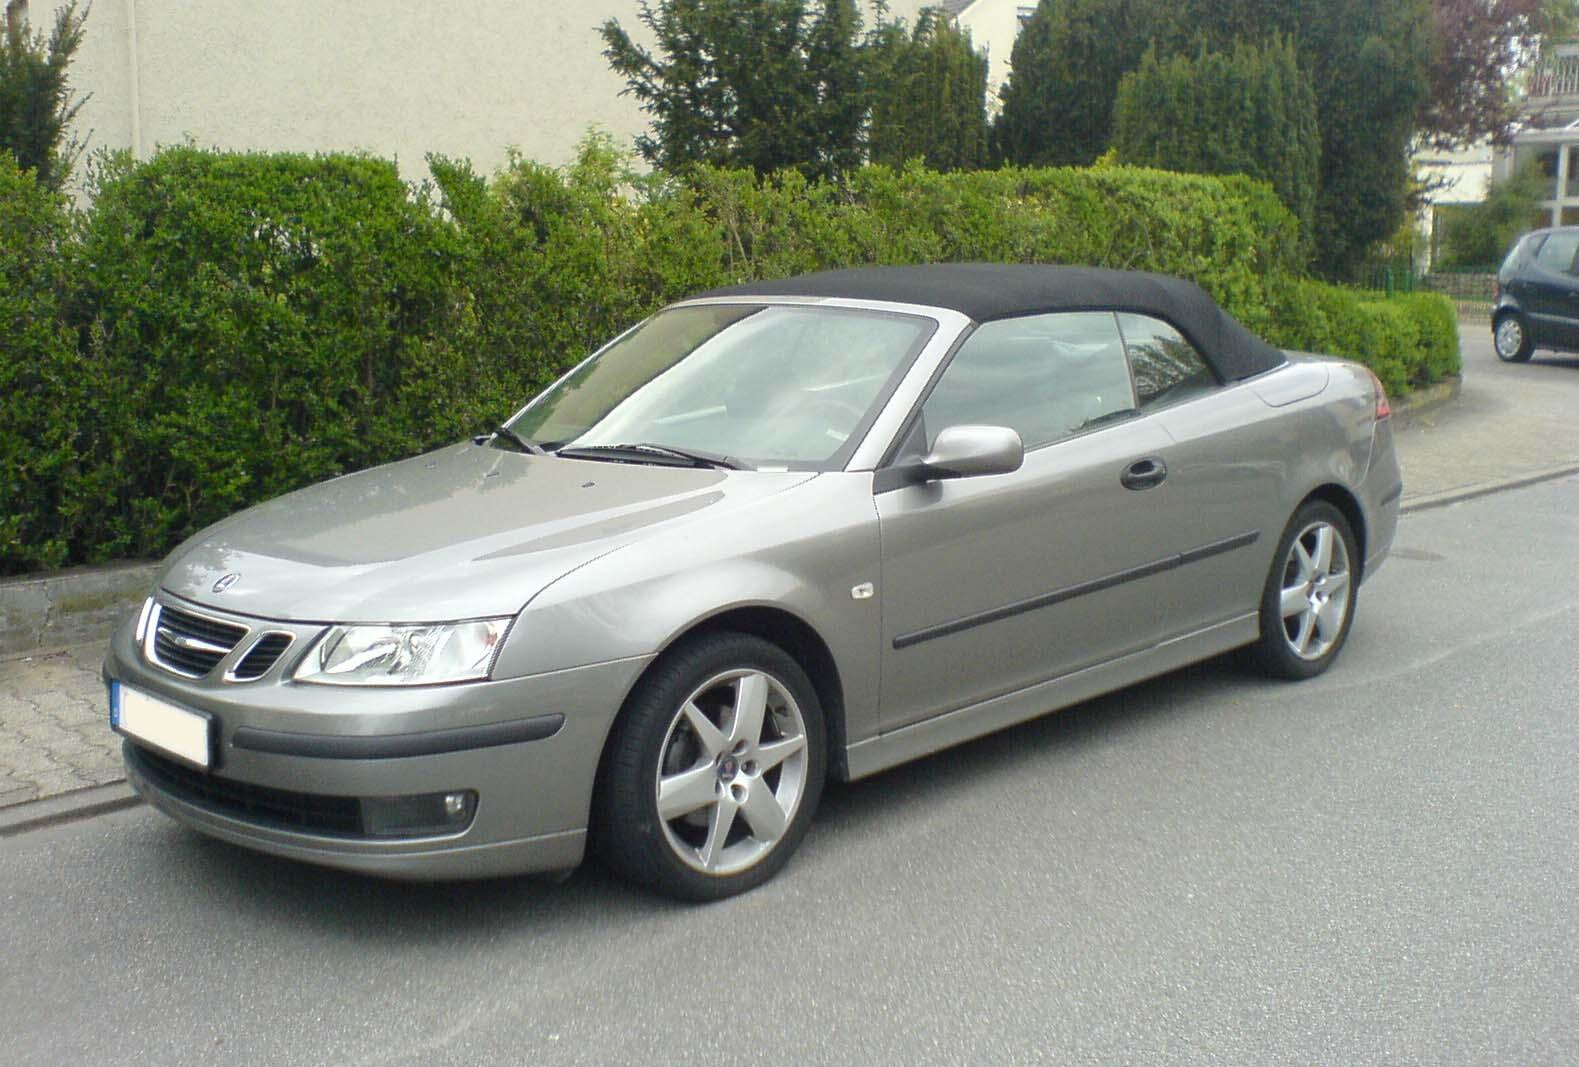 E85 Gas Stations >> Saab 9 5 Wikipedia Autos Post Autos Post | Autos Post